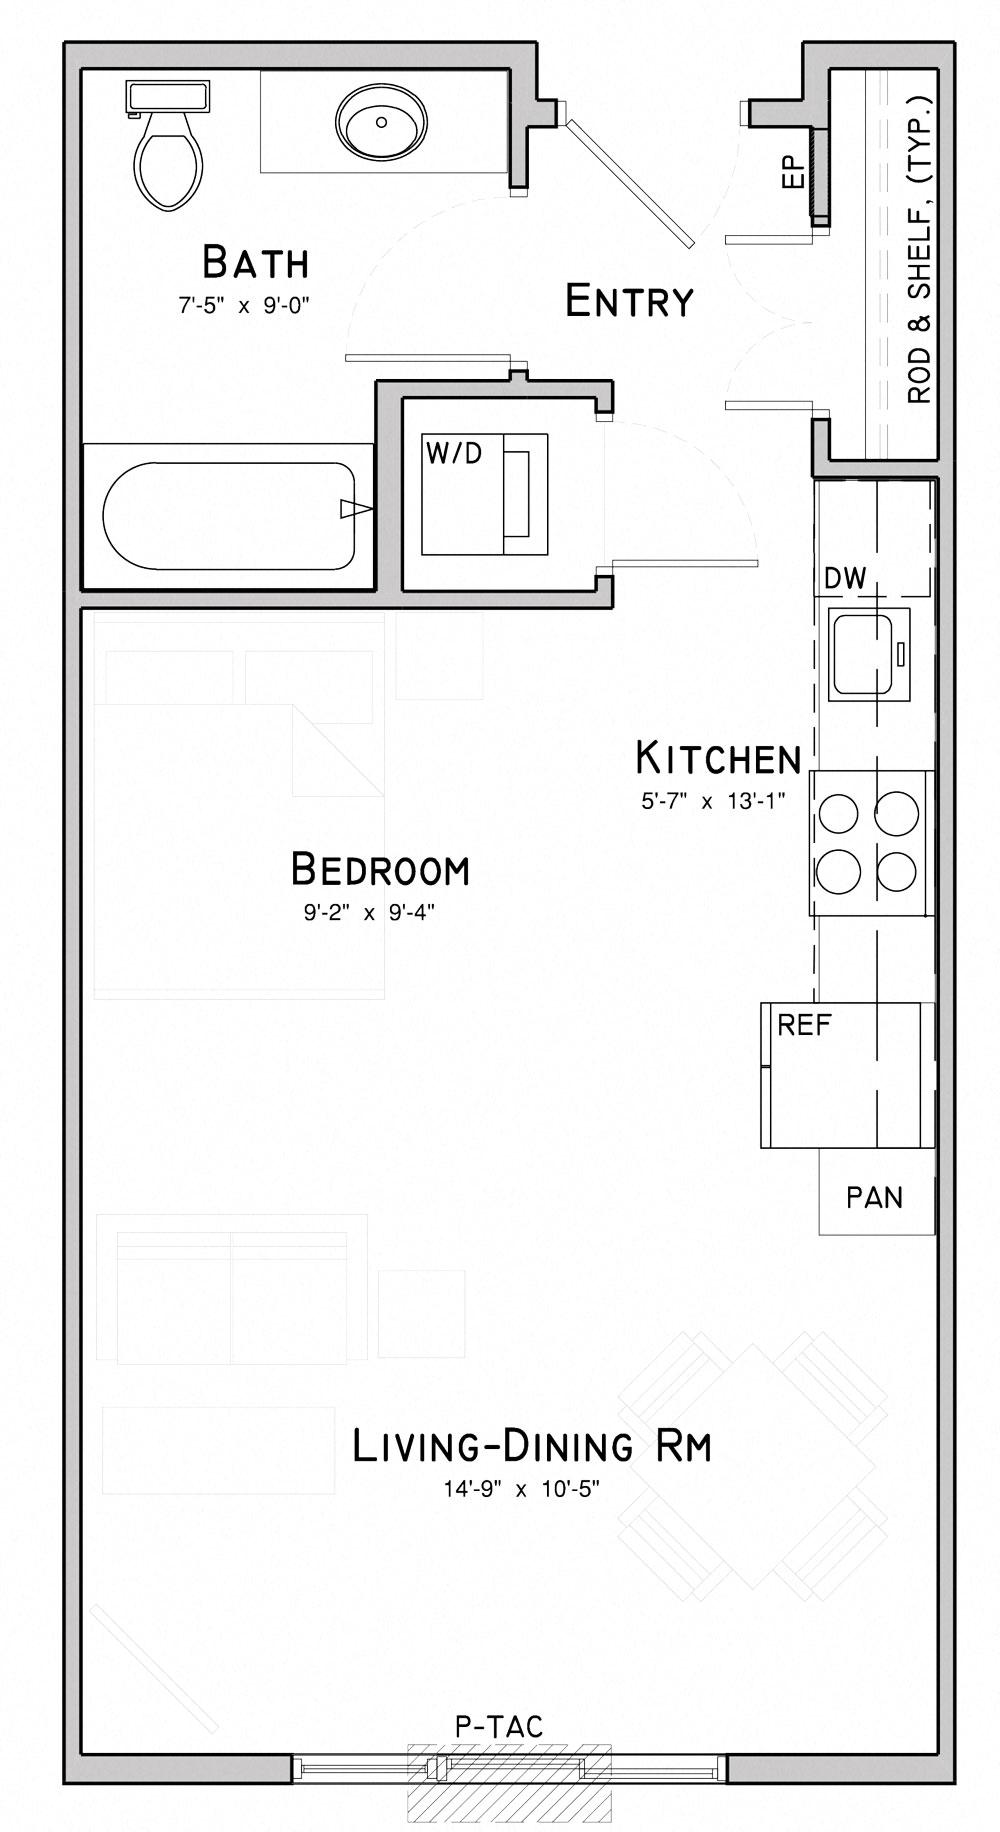 Floor plans | WH Flats | Studio, 1, 2, 3 bedroom apartments for rent